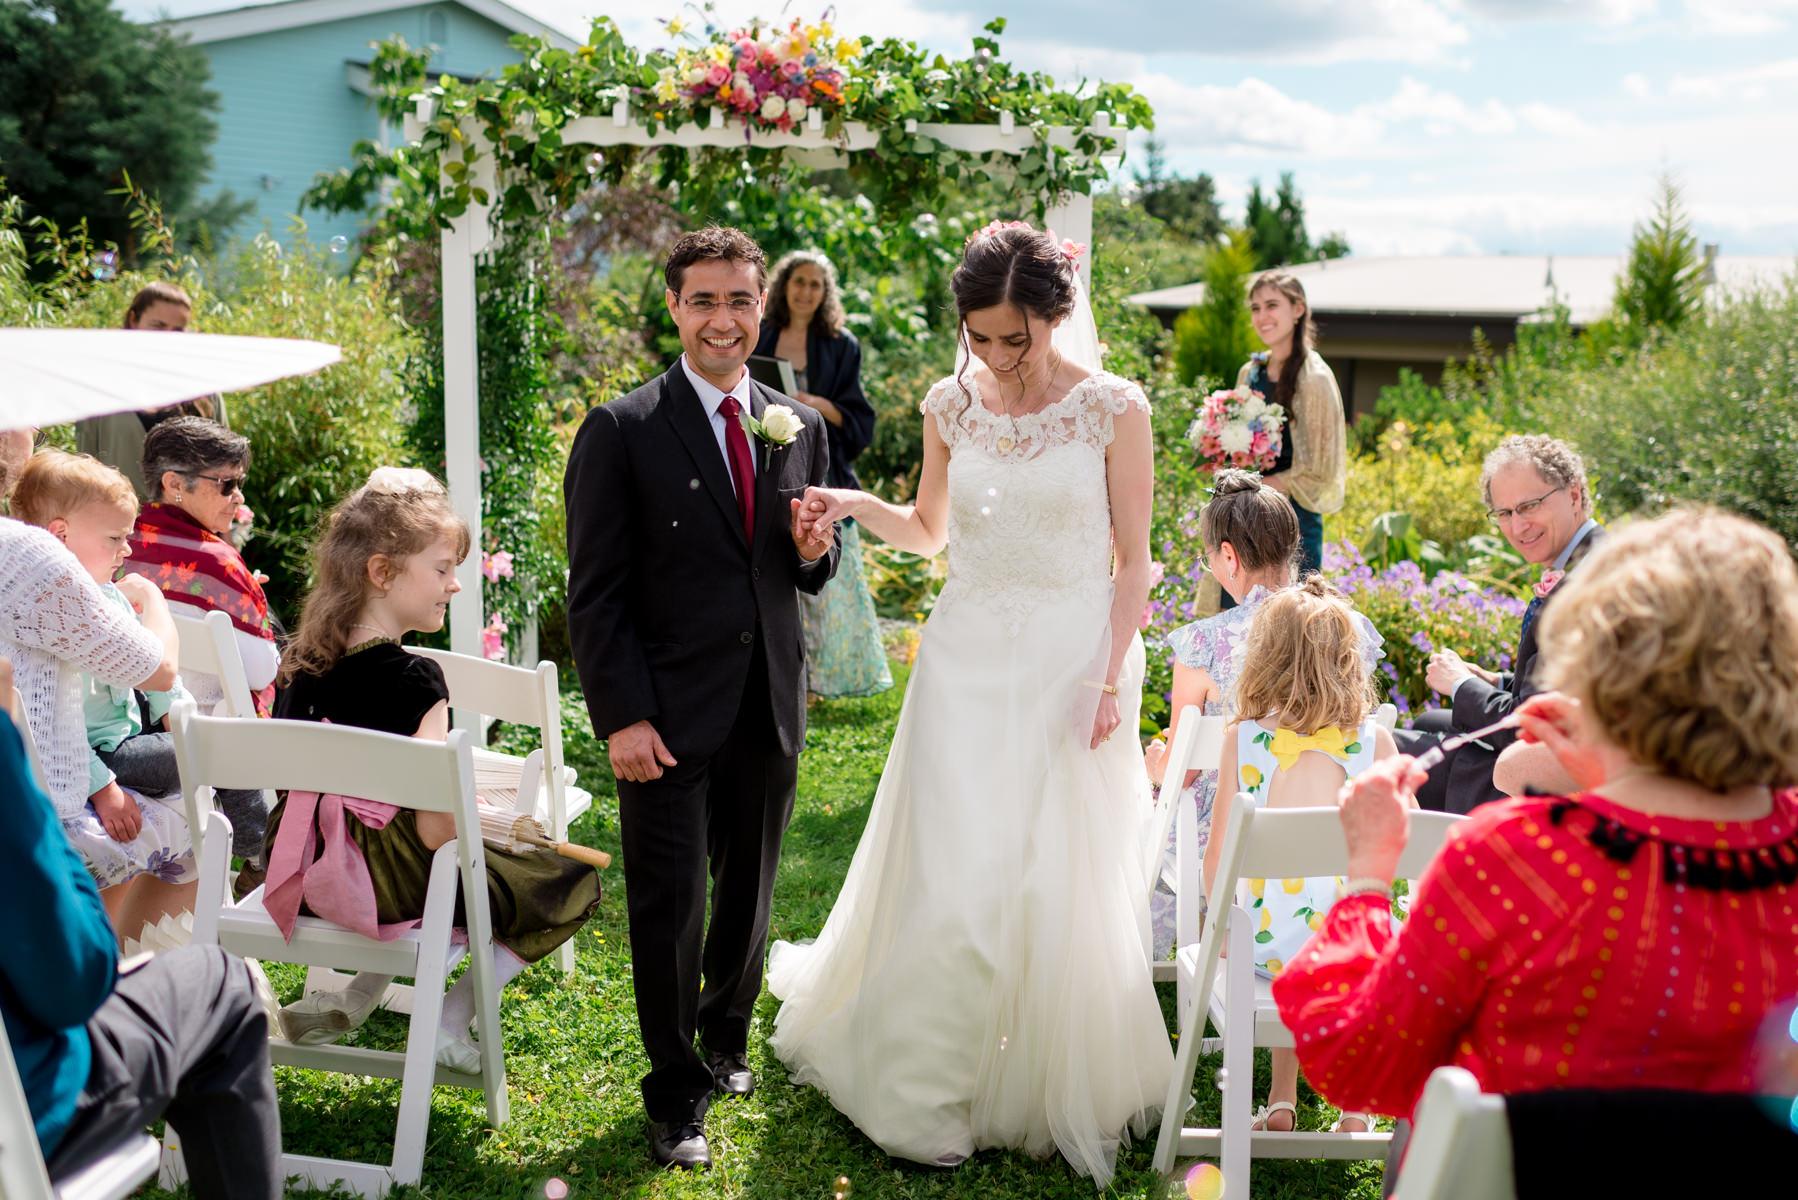 Andrew Tat - Documentary Wedding Photography - Kirkland, Washington - Emily & Cuauh - 18.JPG